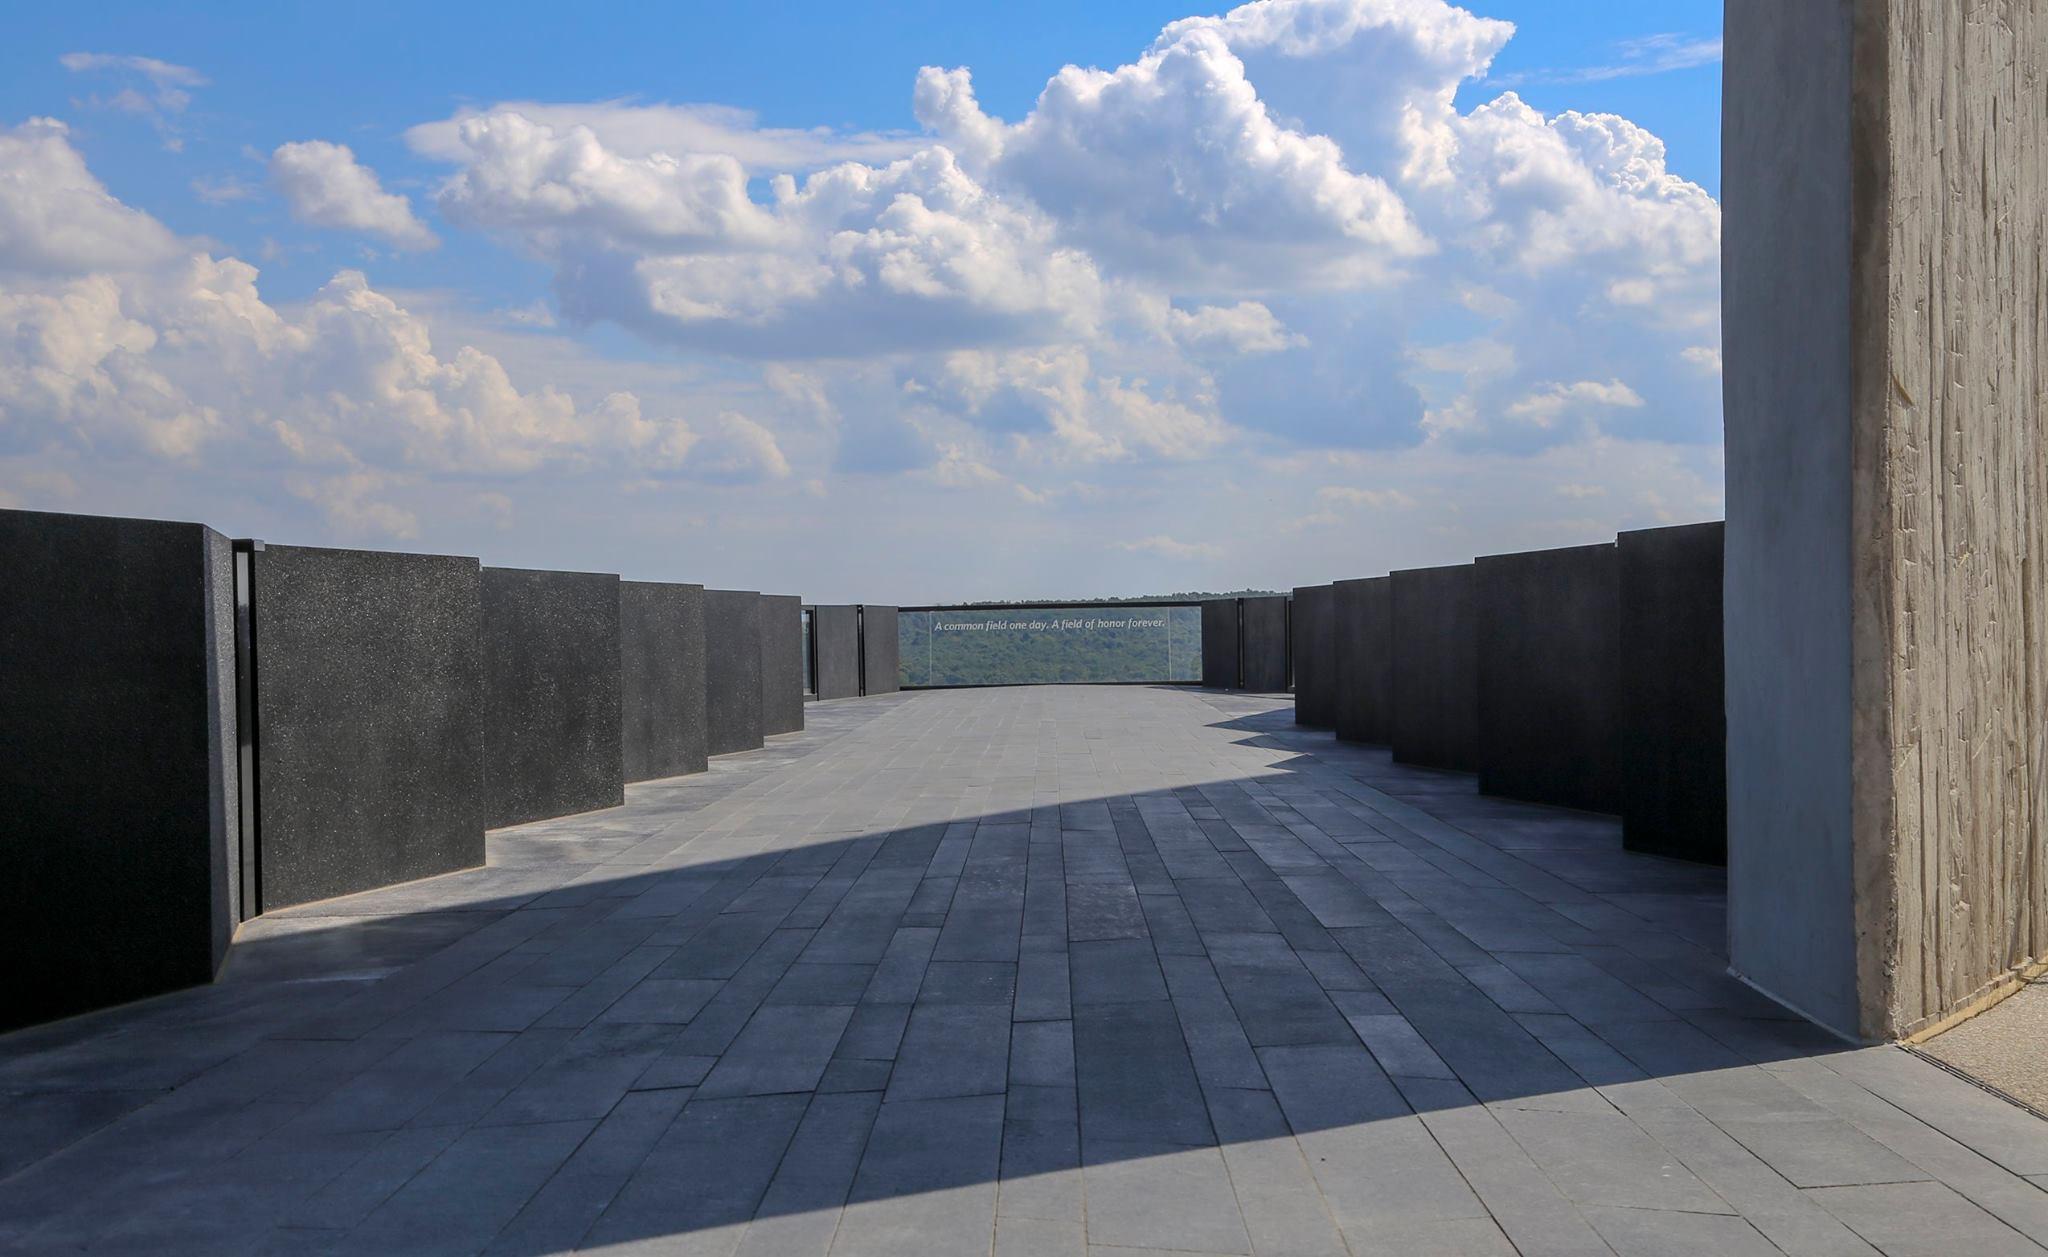 Flight 93 National Memorial Walkway